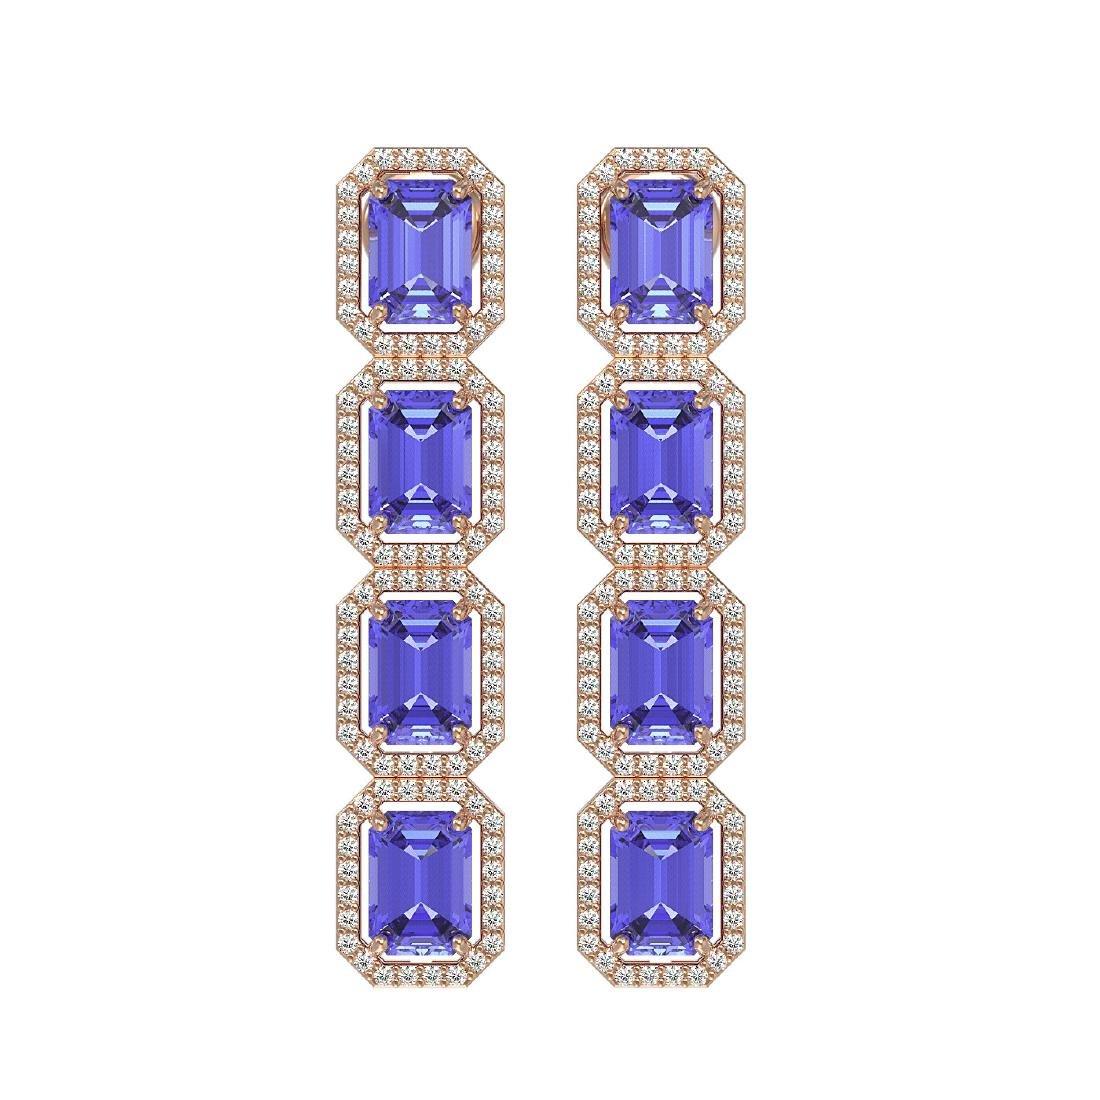 11.93 CTW Tanzanite & Diamond Halo Earrings 10K Rose